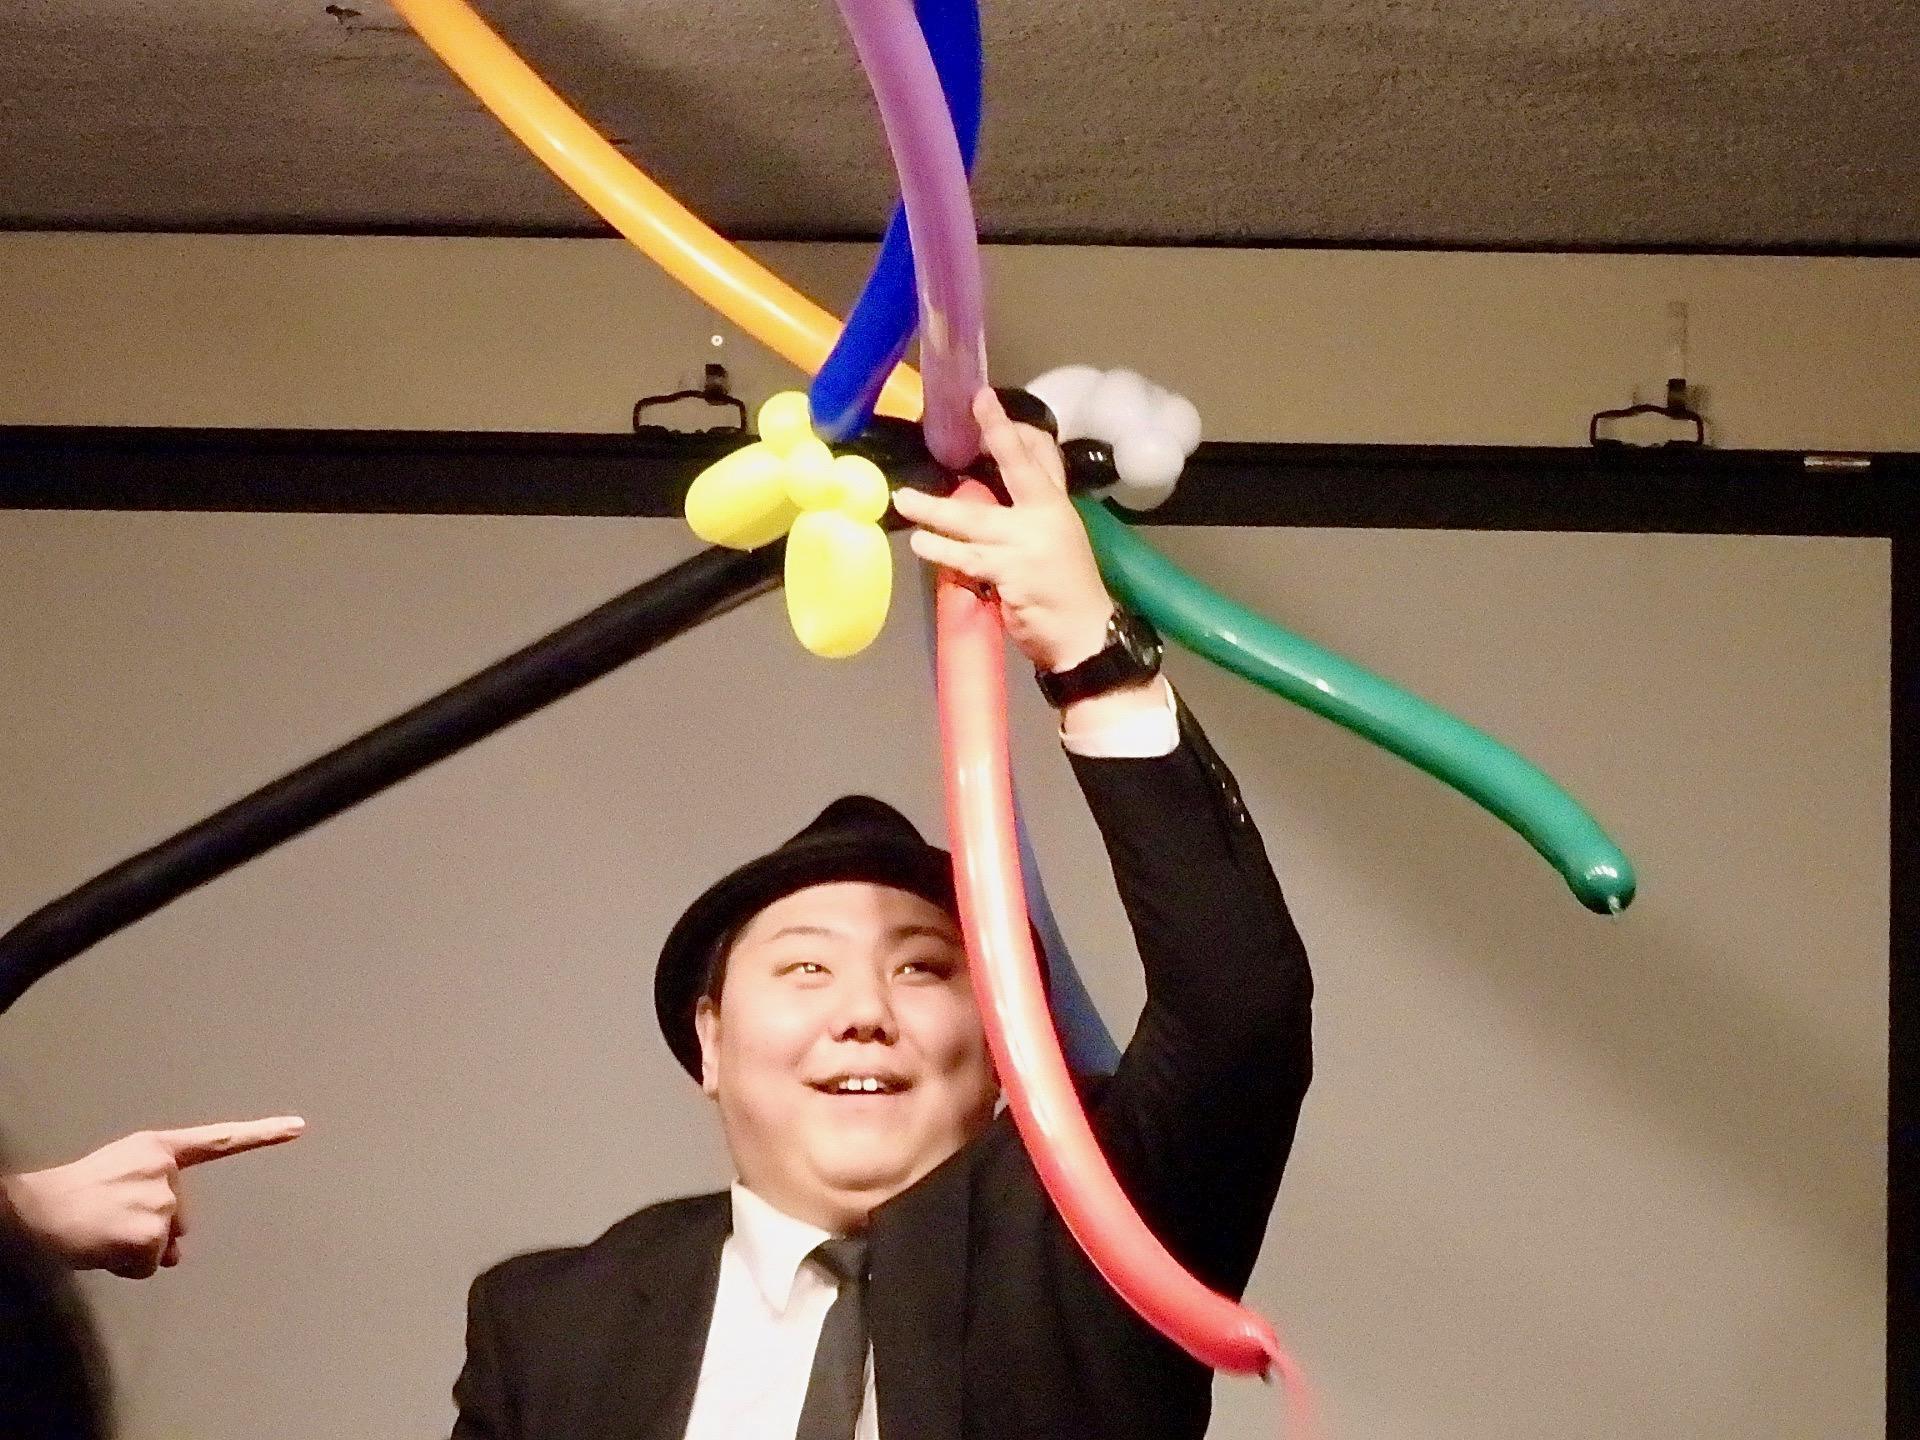 http://news.yoshimoto.co.jp/20180429081945-cce47006962a93609954e77053ccd91bc4c1a4e6.jpg